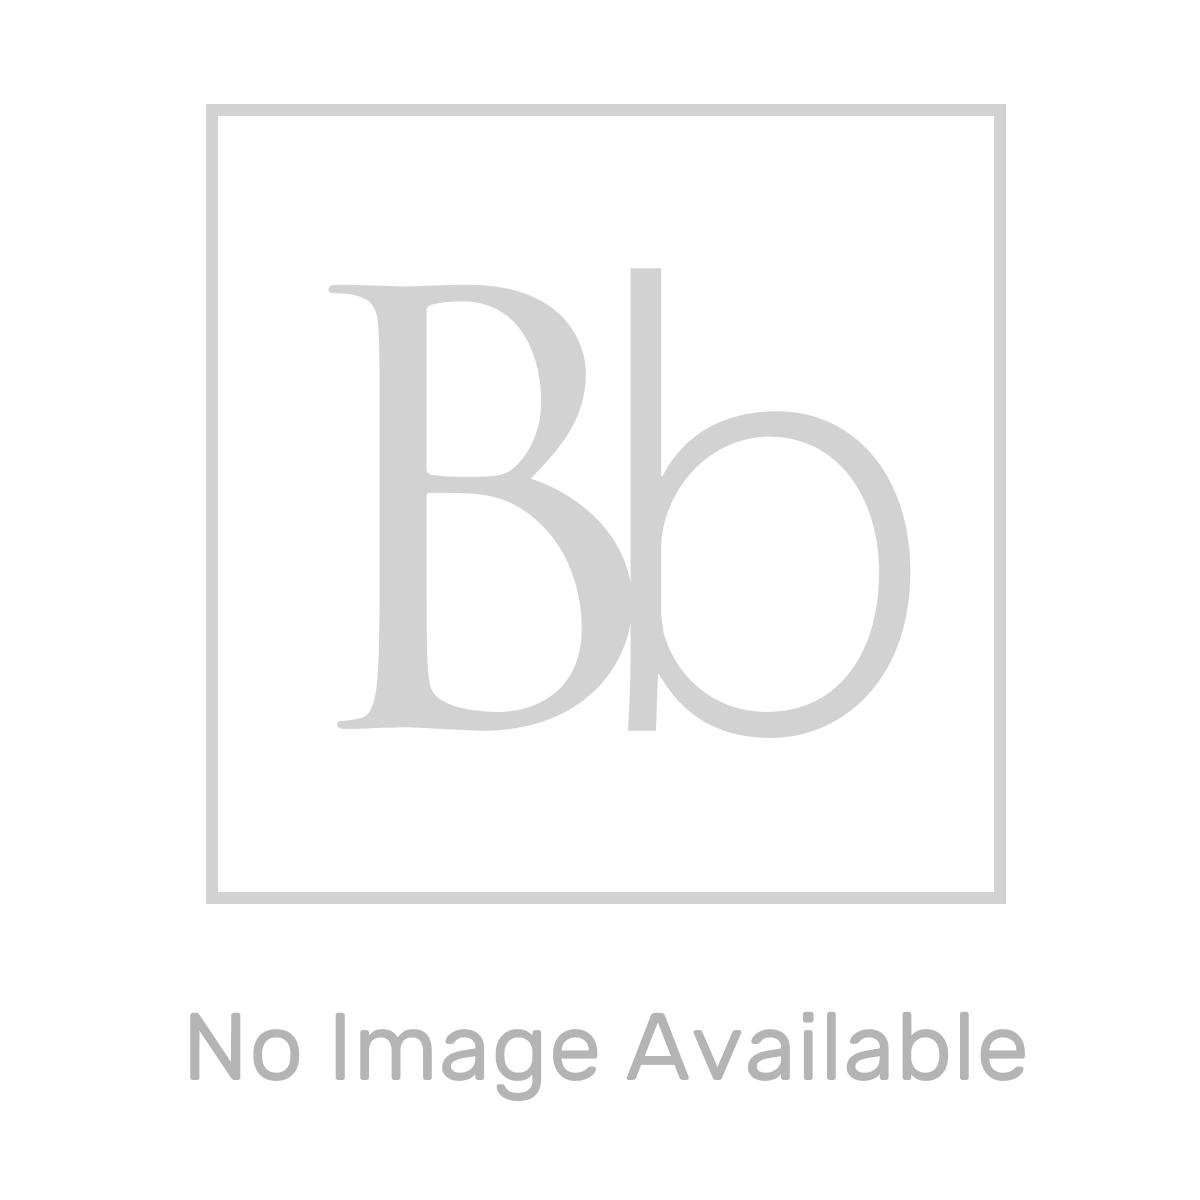 Reina Flat Anthracite Single Panel Aluminium Radiator 600 x 588mm